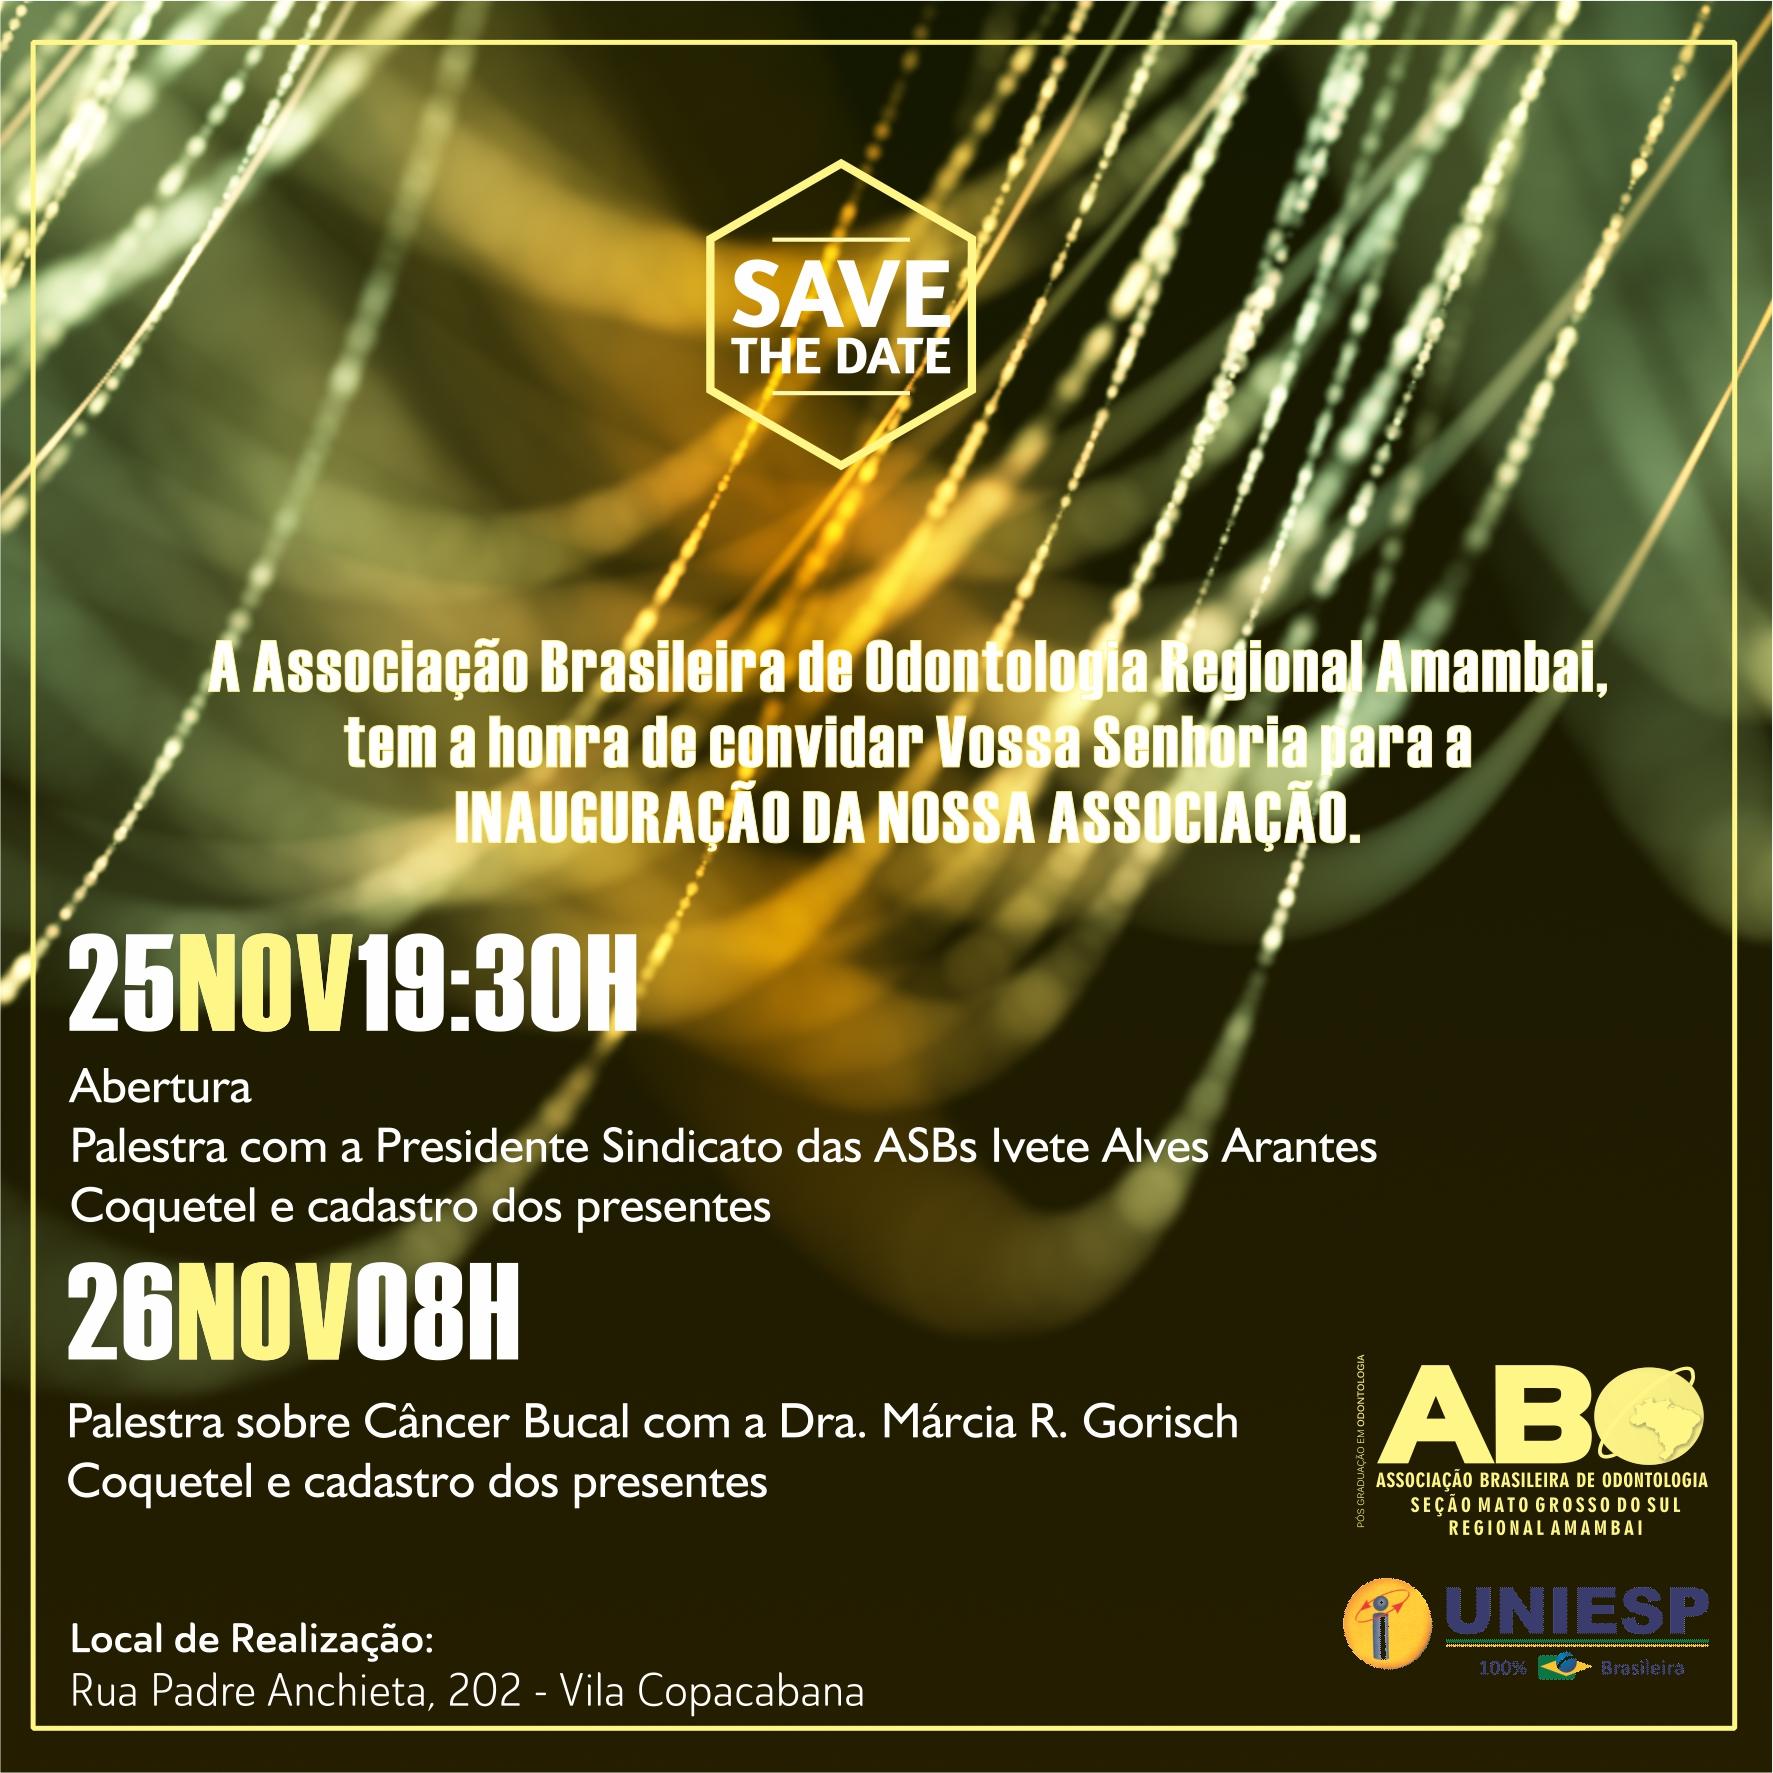 ABO-Amambai realiza evento de lançamento da entidade